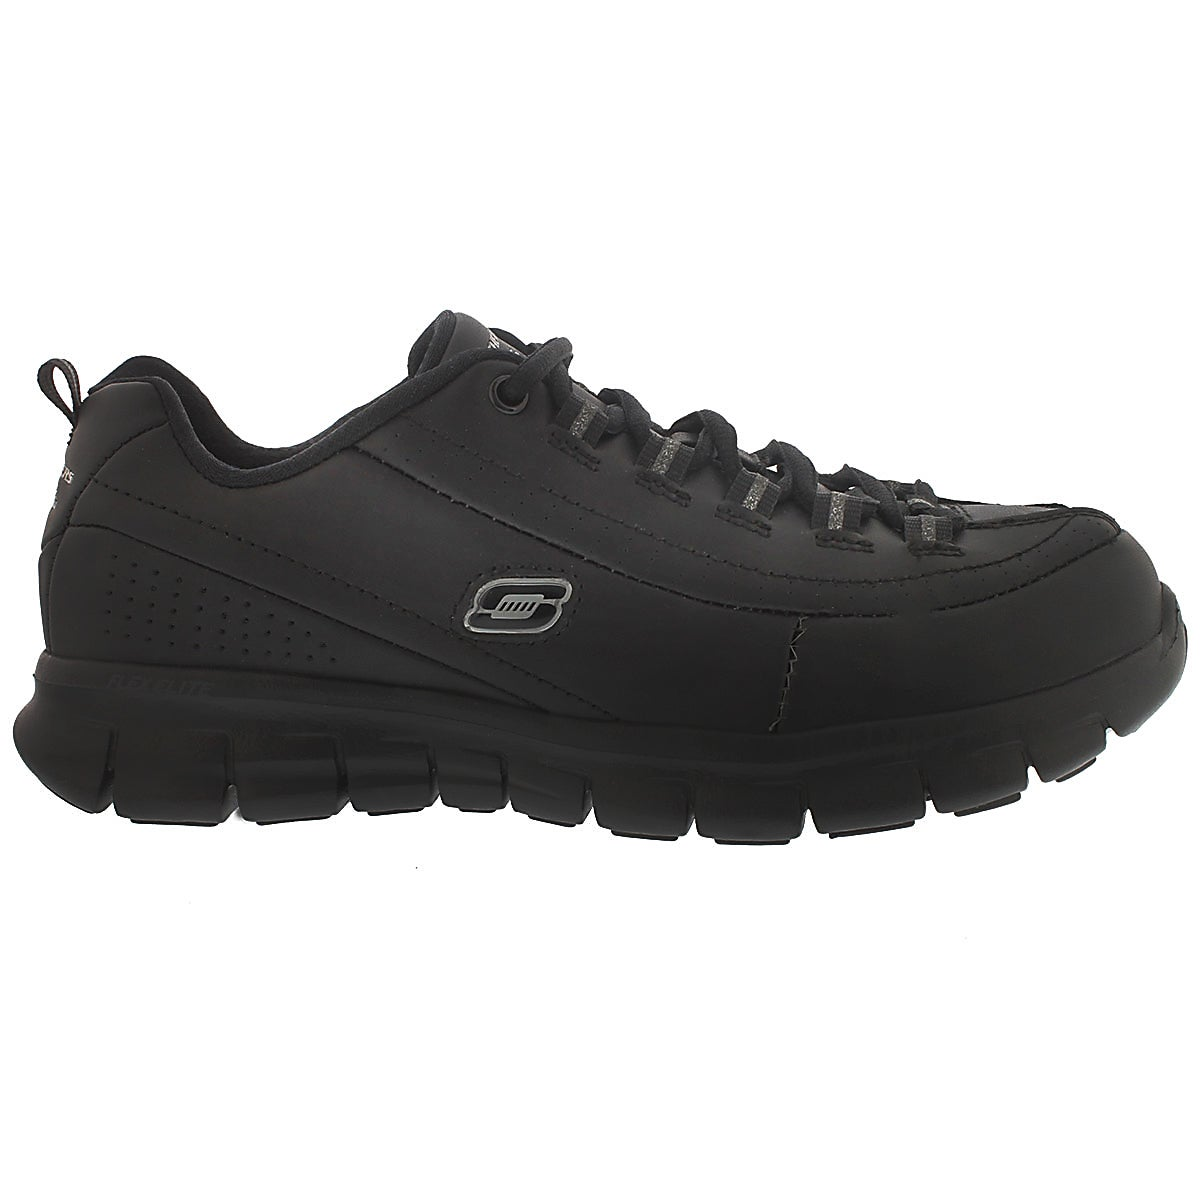 Lds Elite Status blk laceup sneaker-Wide